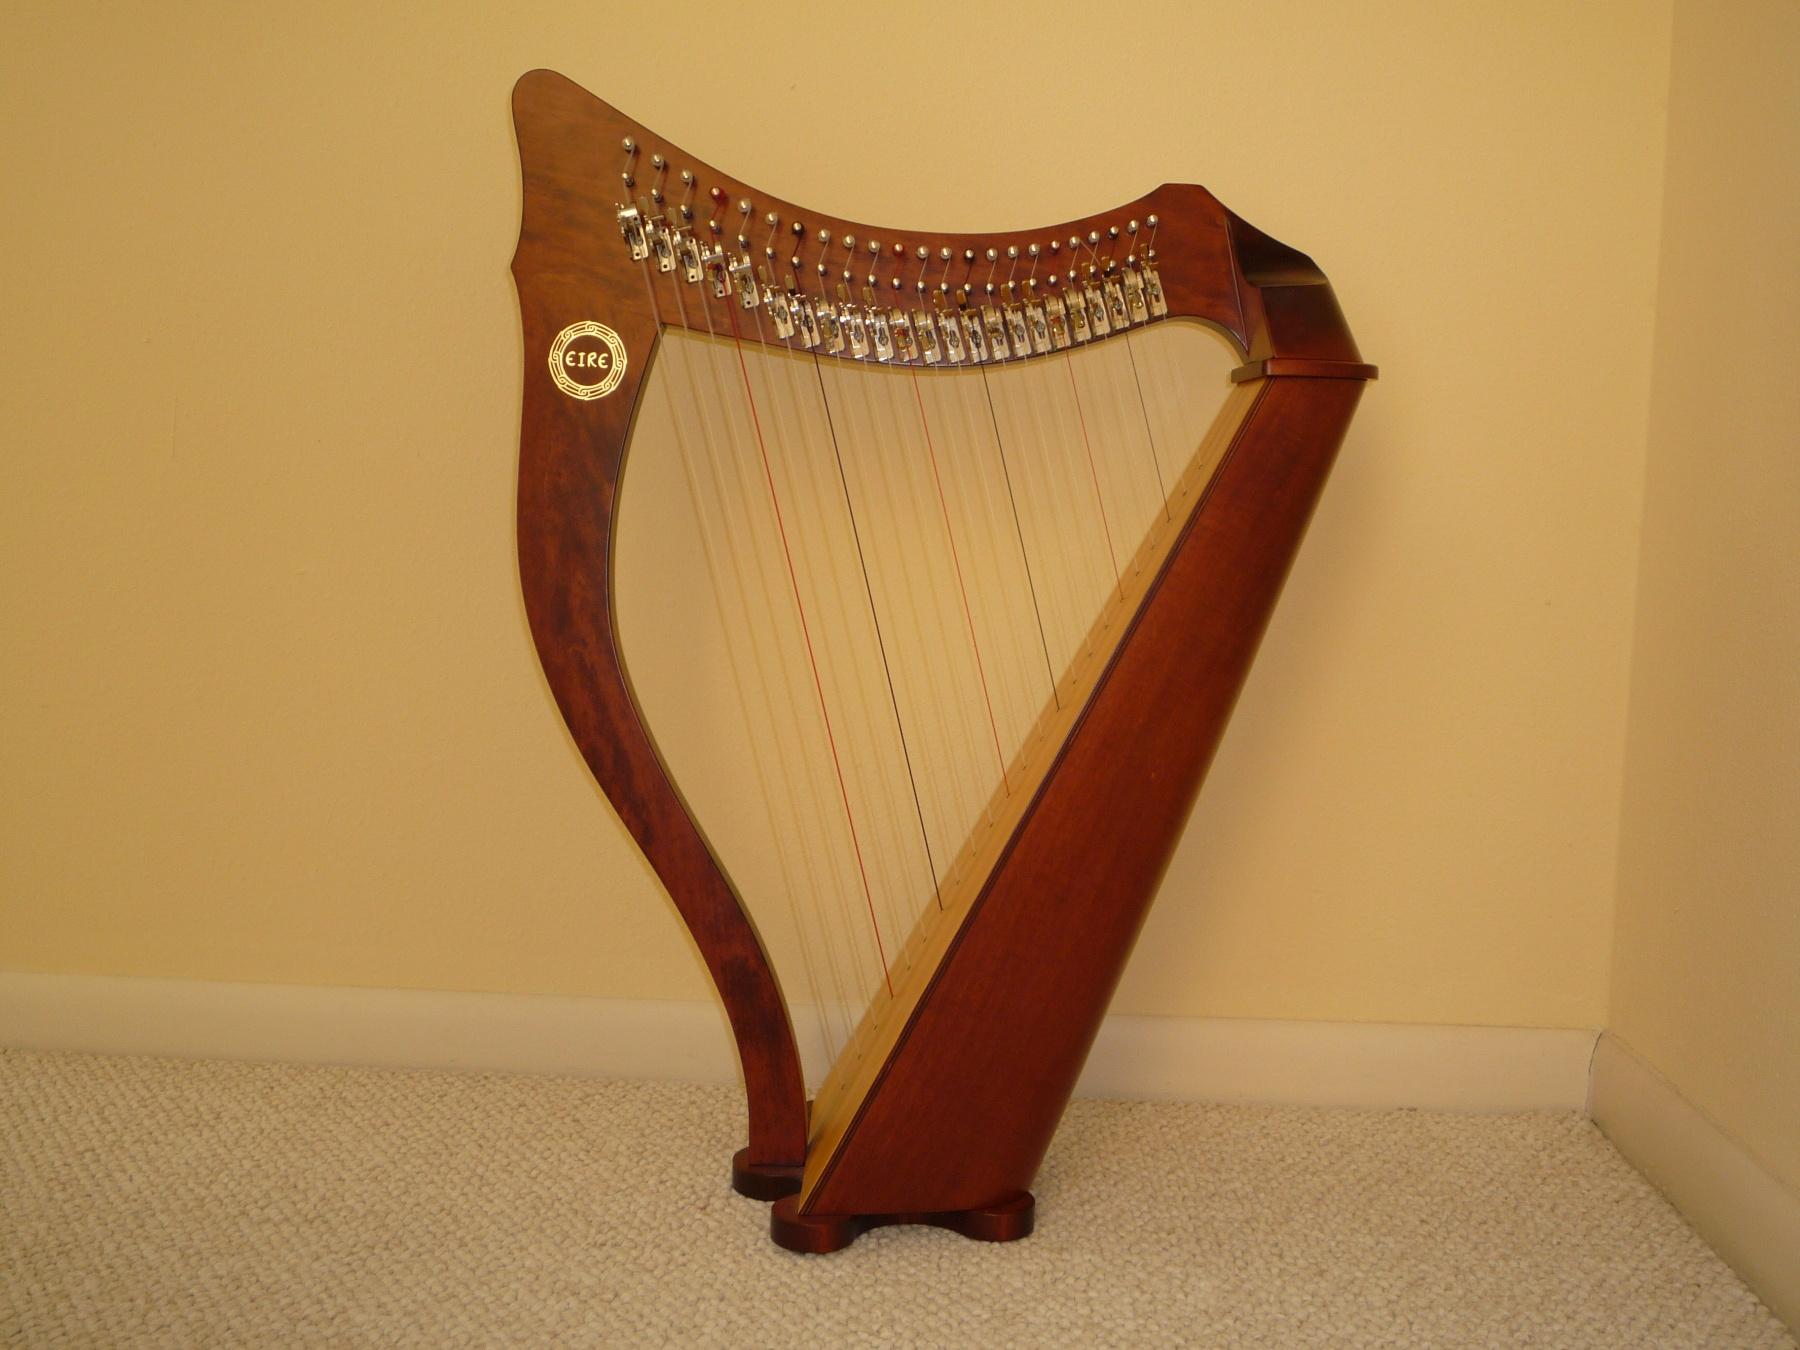 lap harpsichord - photo #40